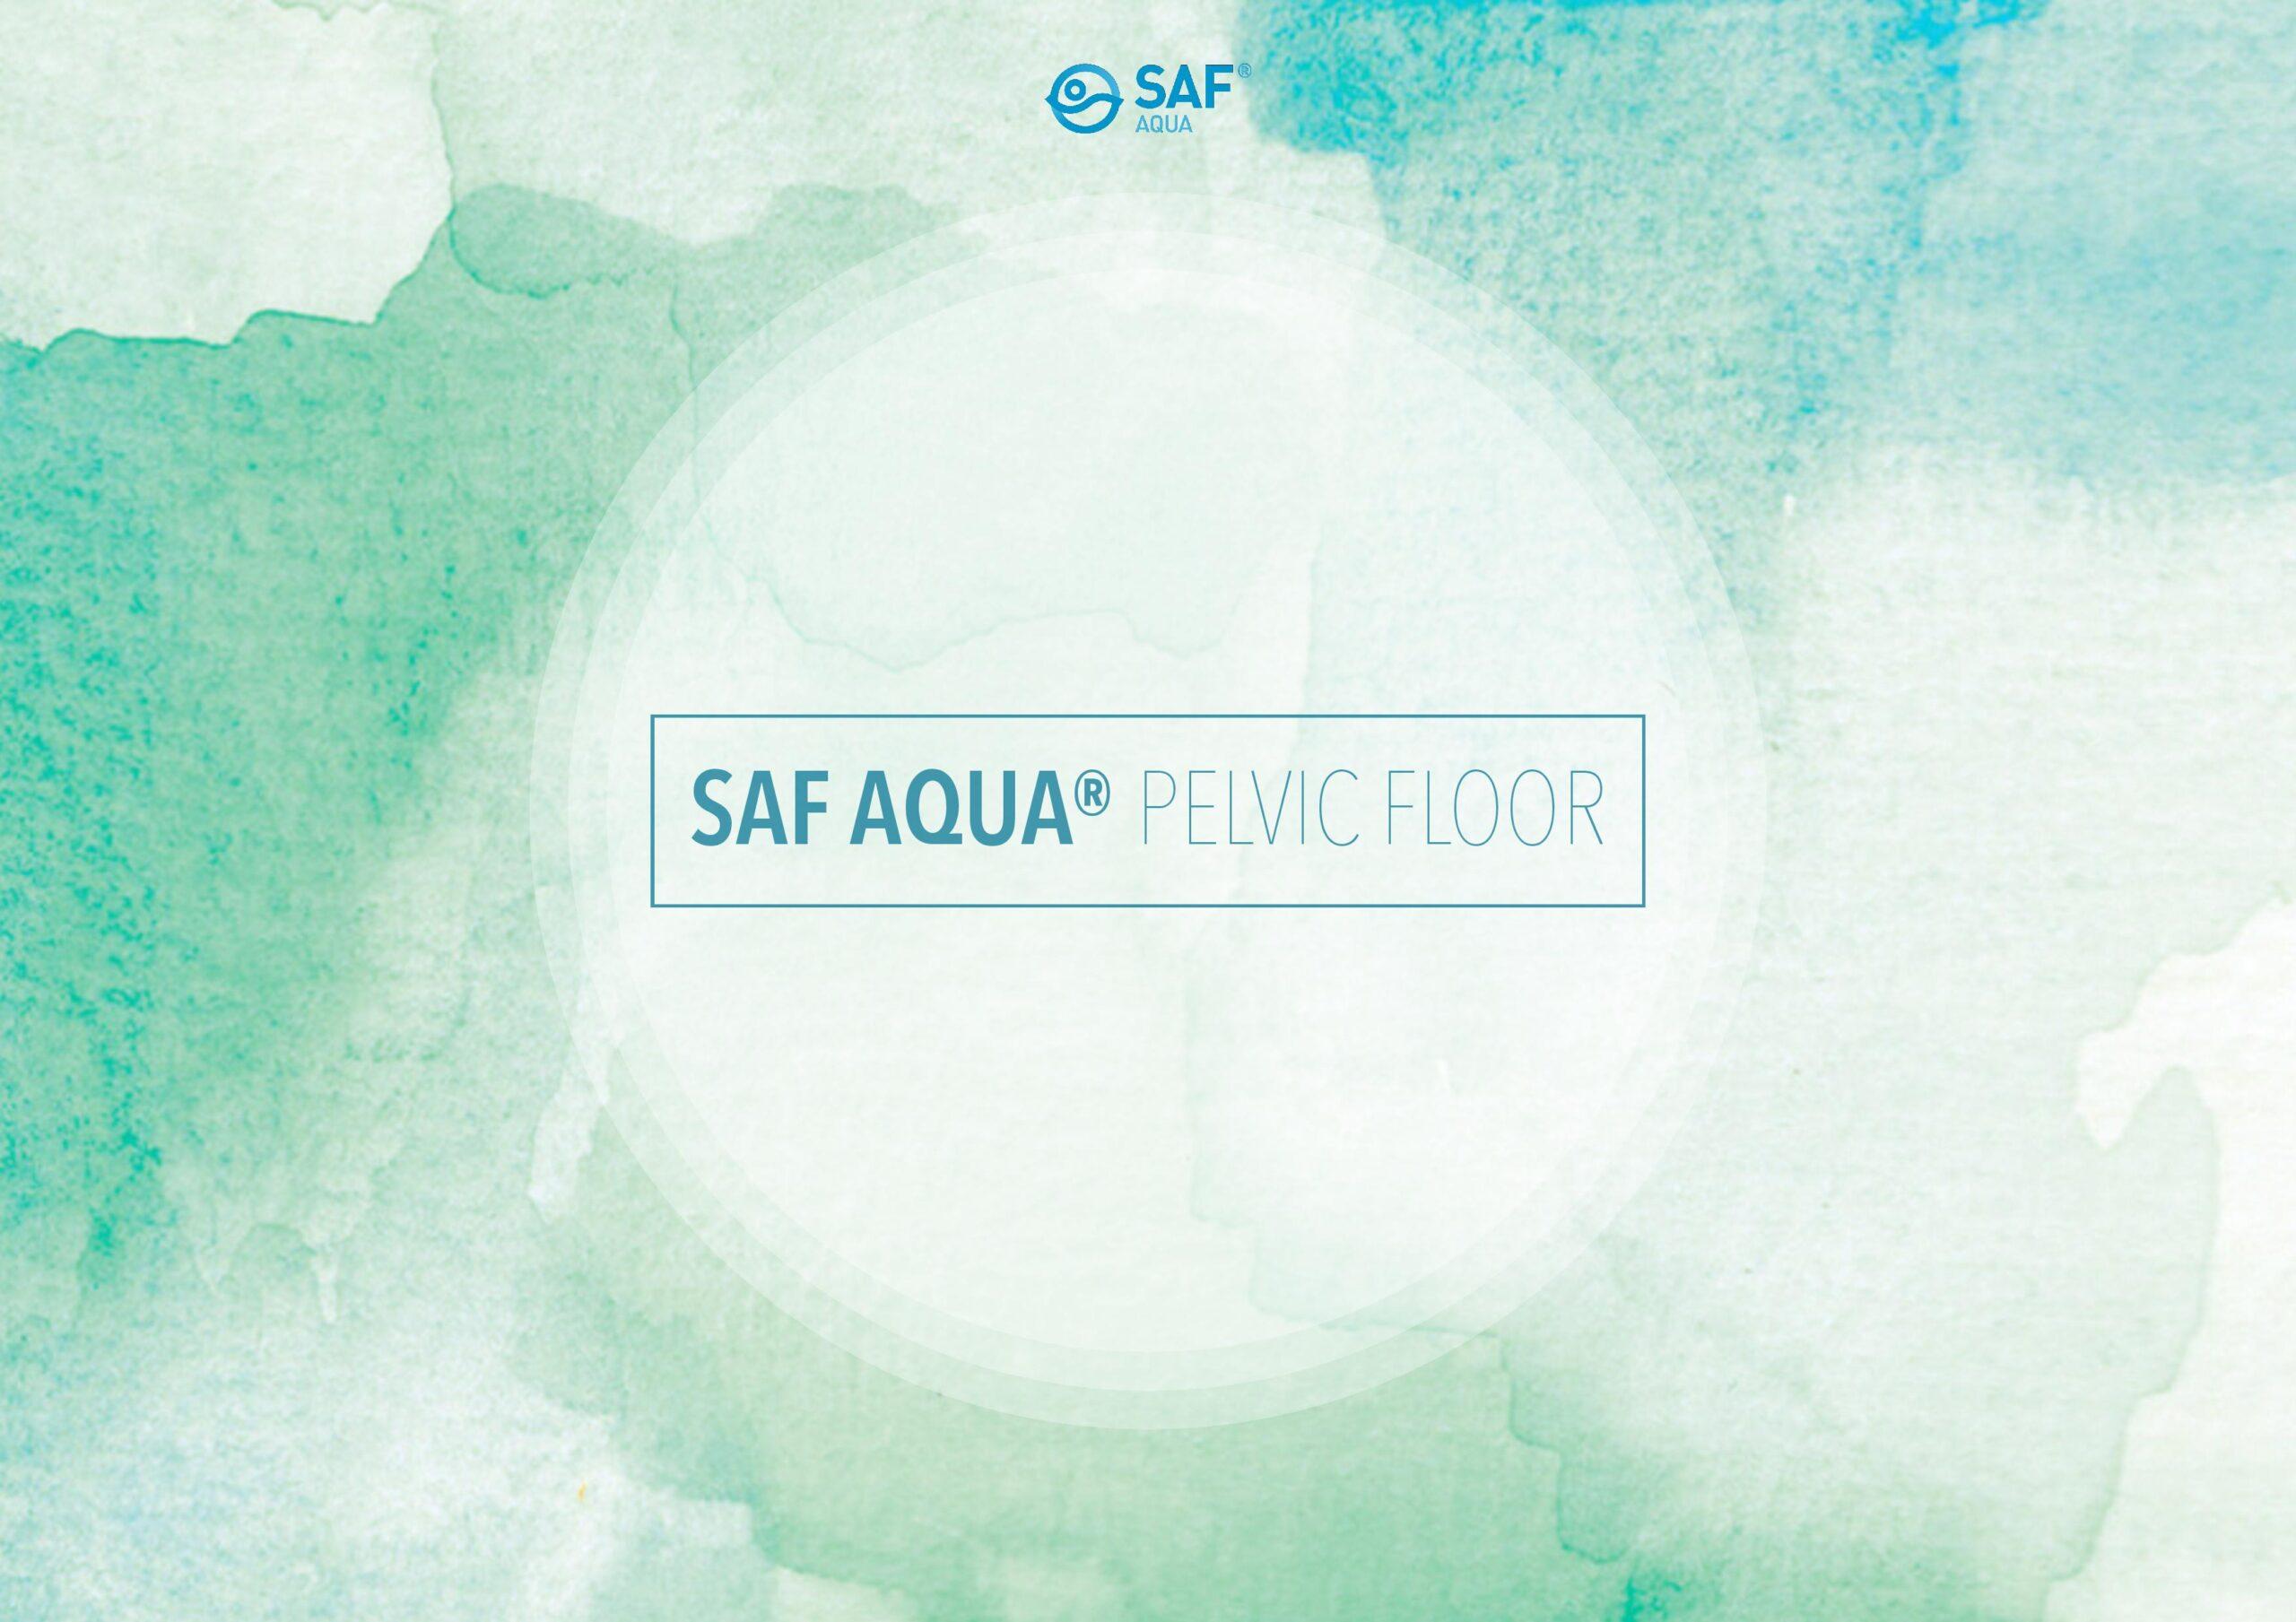 SAF AQUA Pelvic Floor